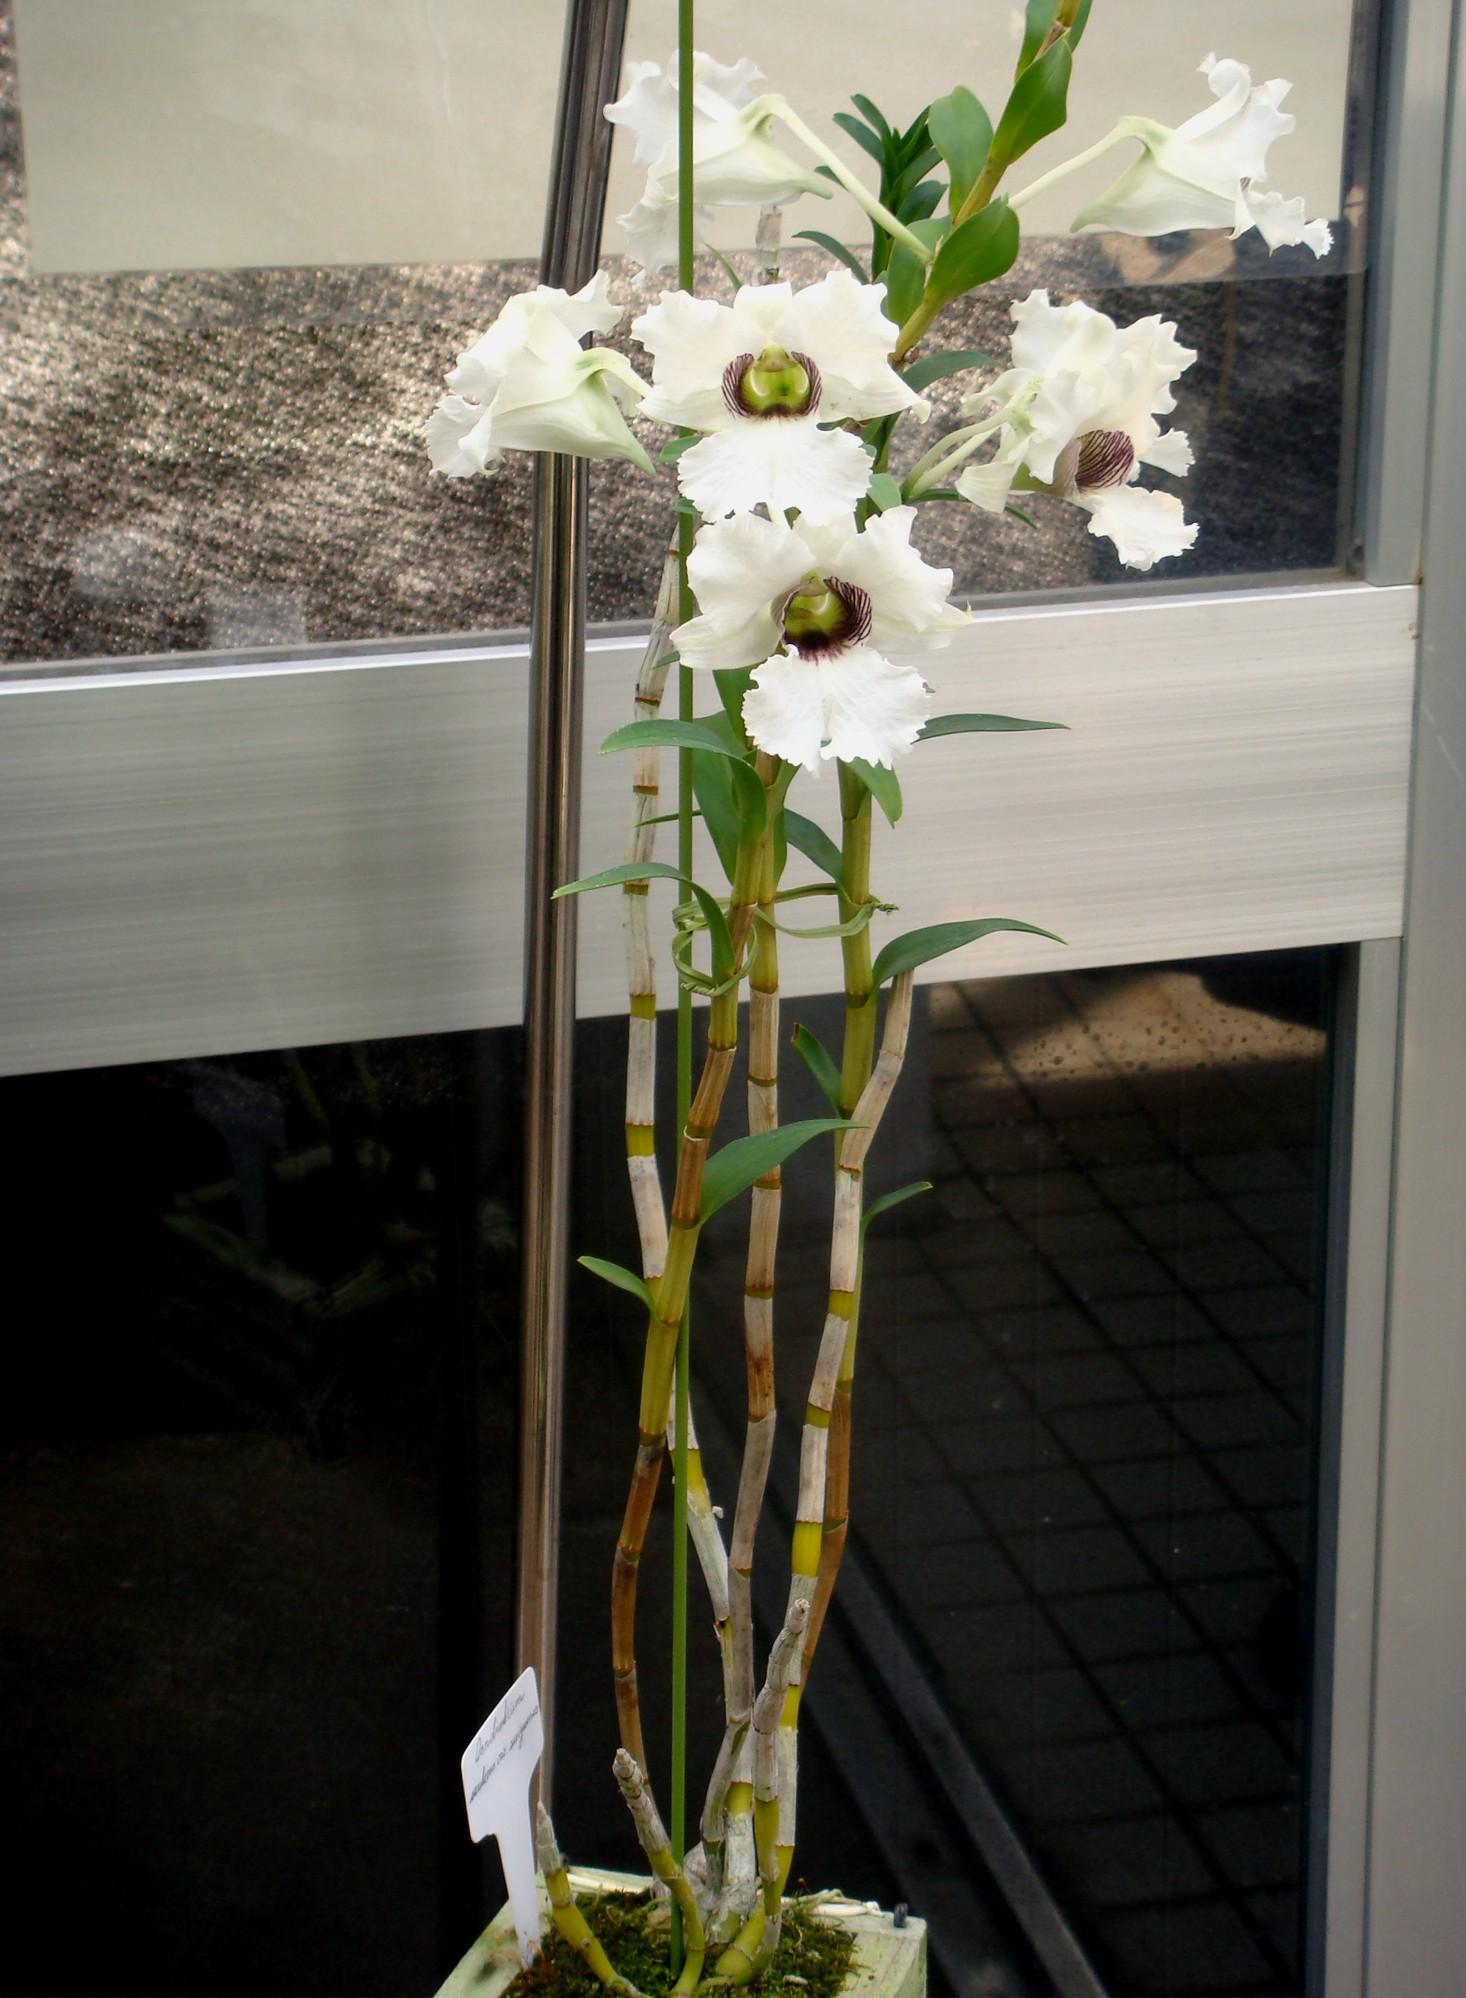 http://orchids.la.coocan.jp/Dendrobium/Dendrobium%20surigaense/DSC07677.JPG